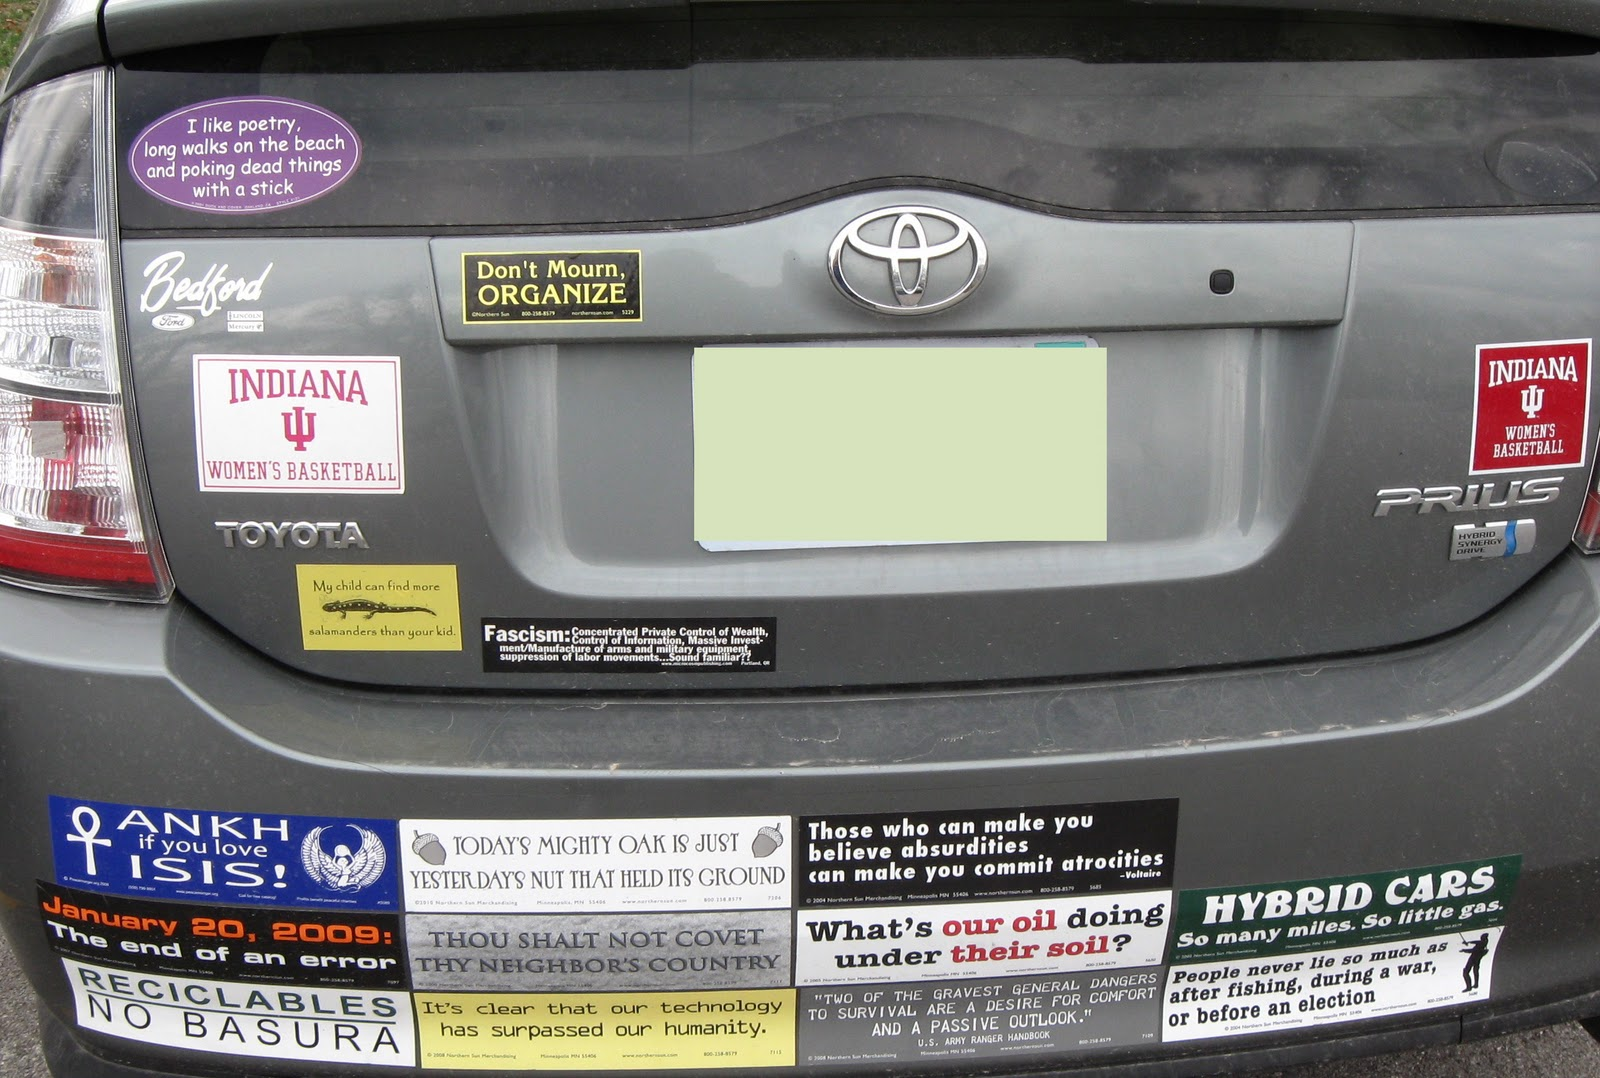 Anti Libya War Bumper Stickers Spotted Already